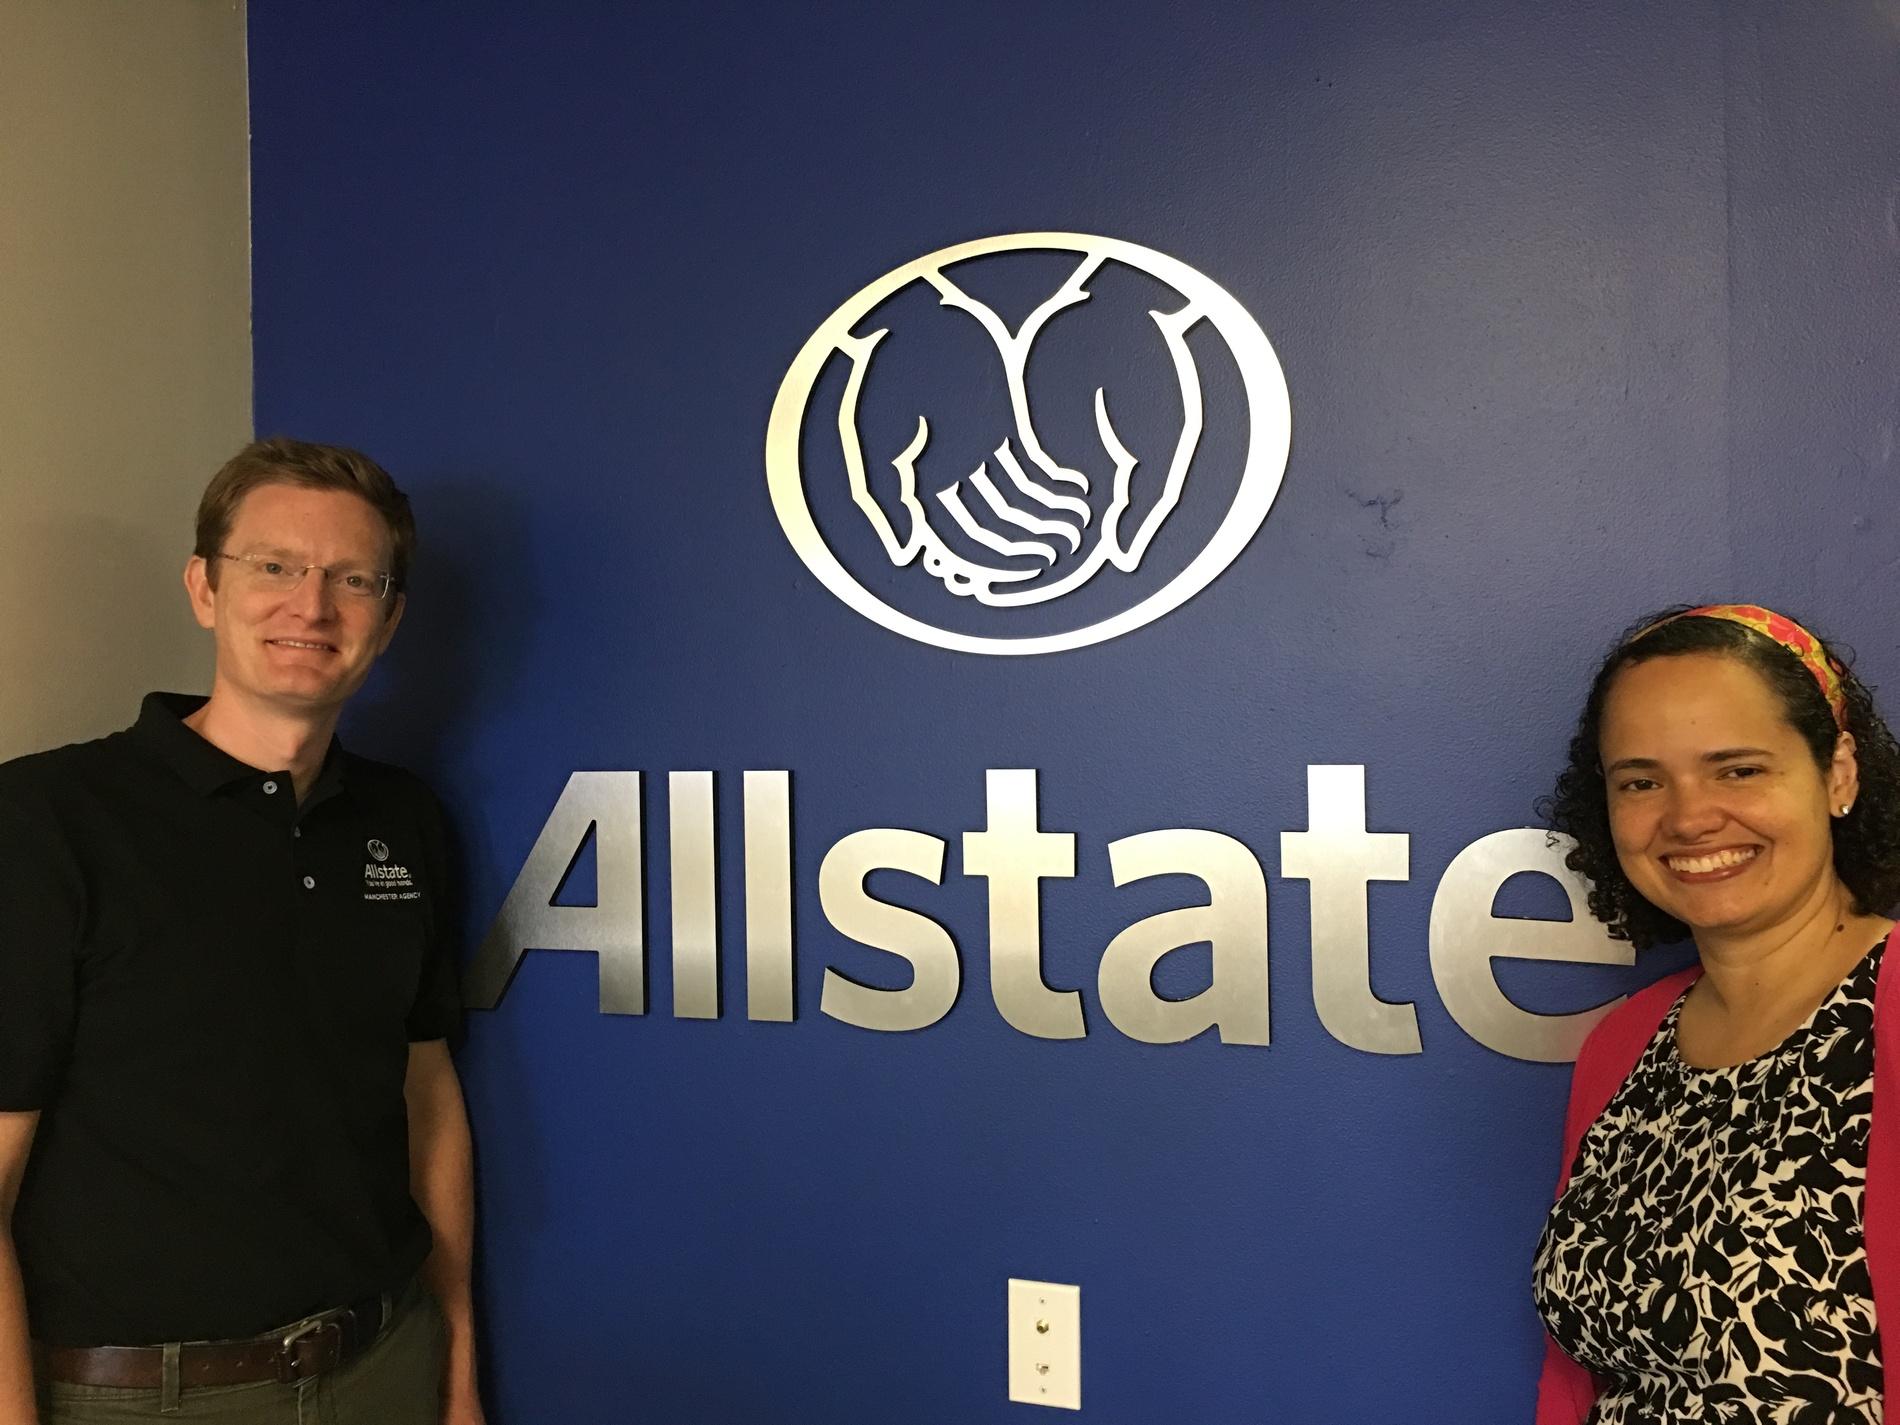 Allstate | Car Insurance in Lemont, IL - Beatriz Quinones